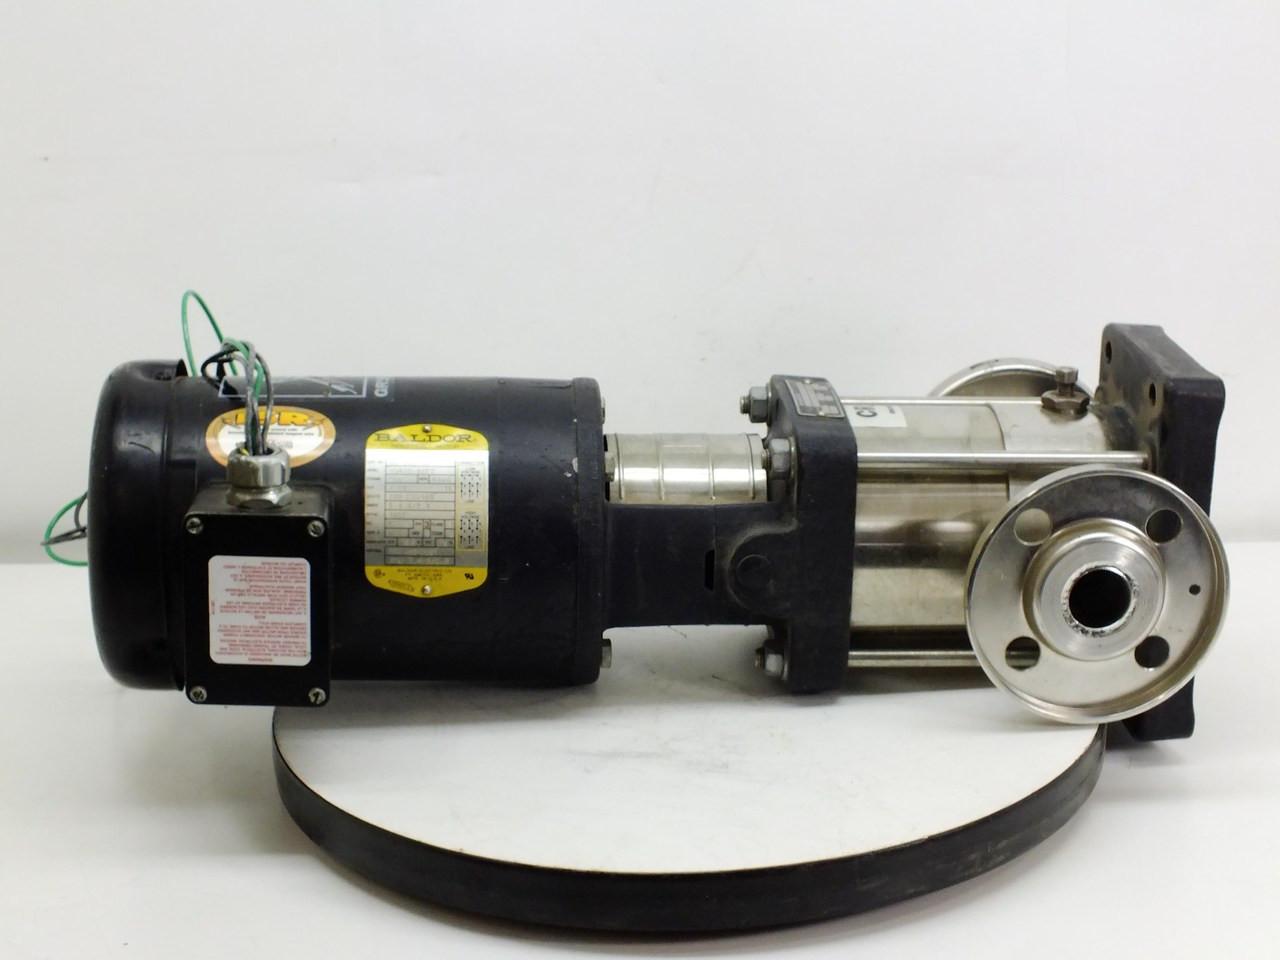 Baldor 1 5 hp motor with grundfos cr 2 water for Baldor 1 5 hp motor